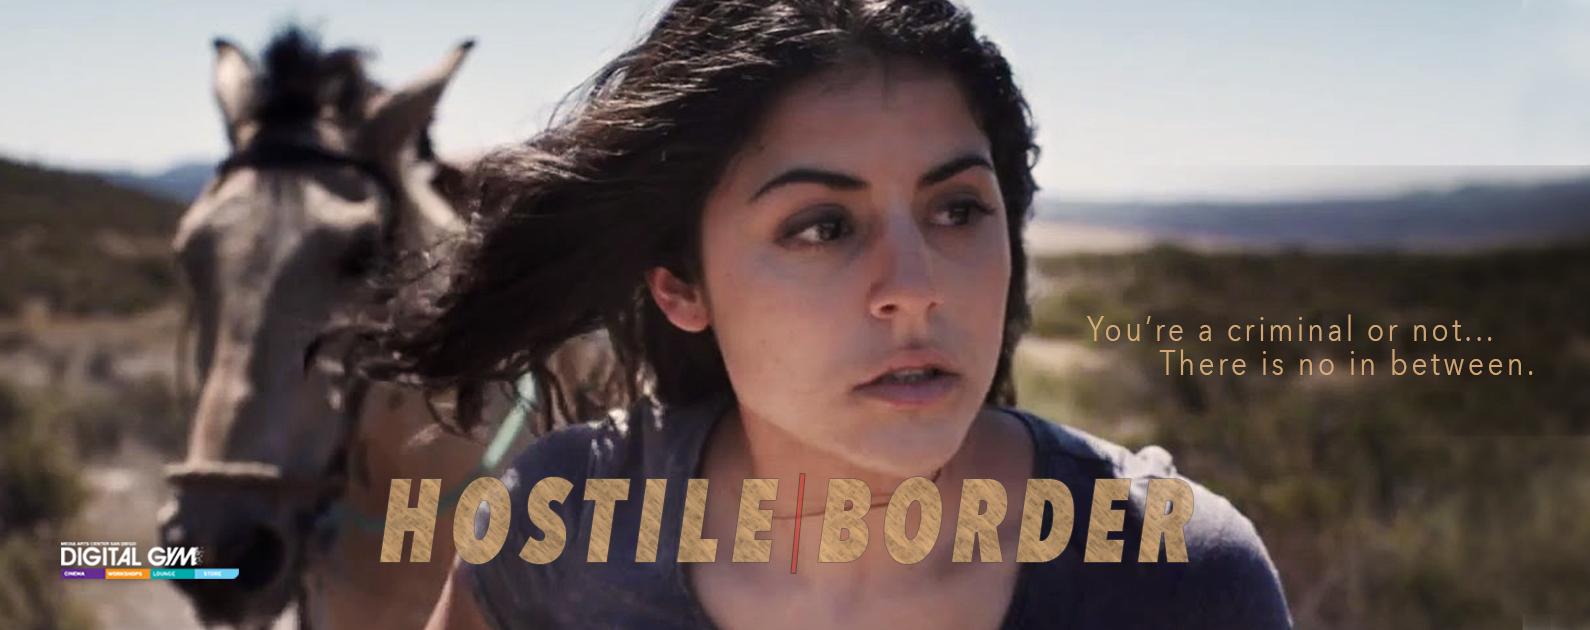 Immigration Thriller Hostile Border Now Playing (April 15-21)